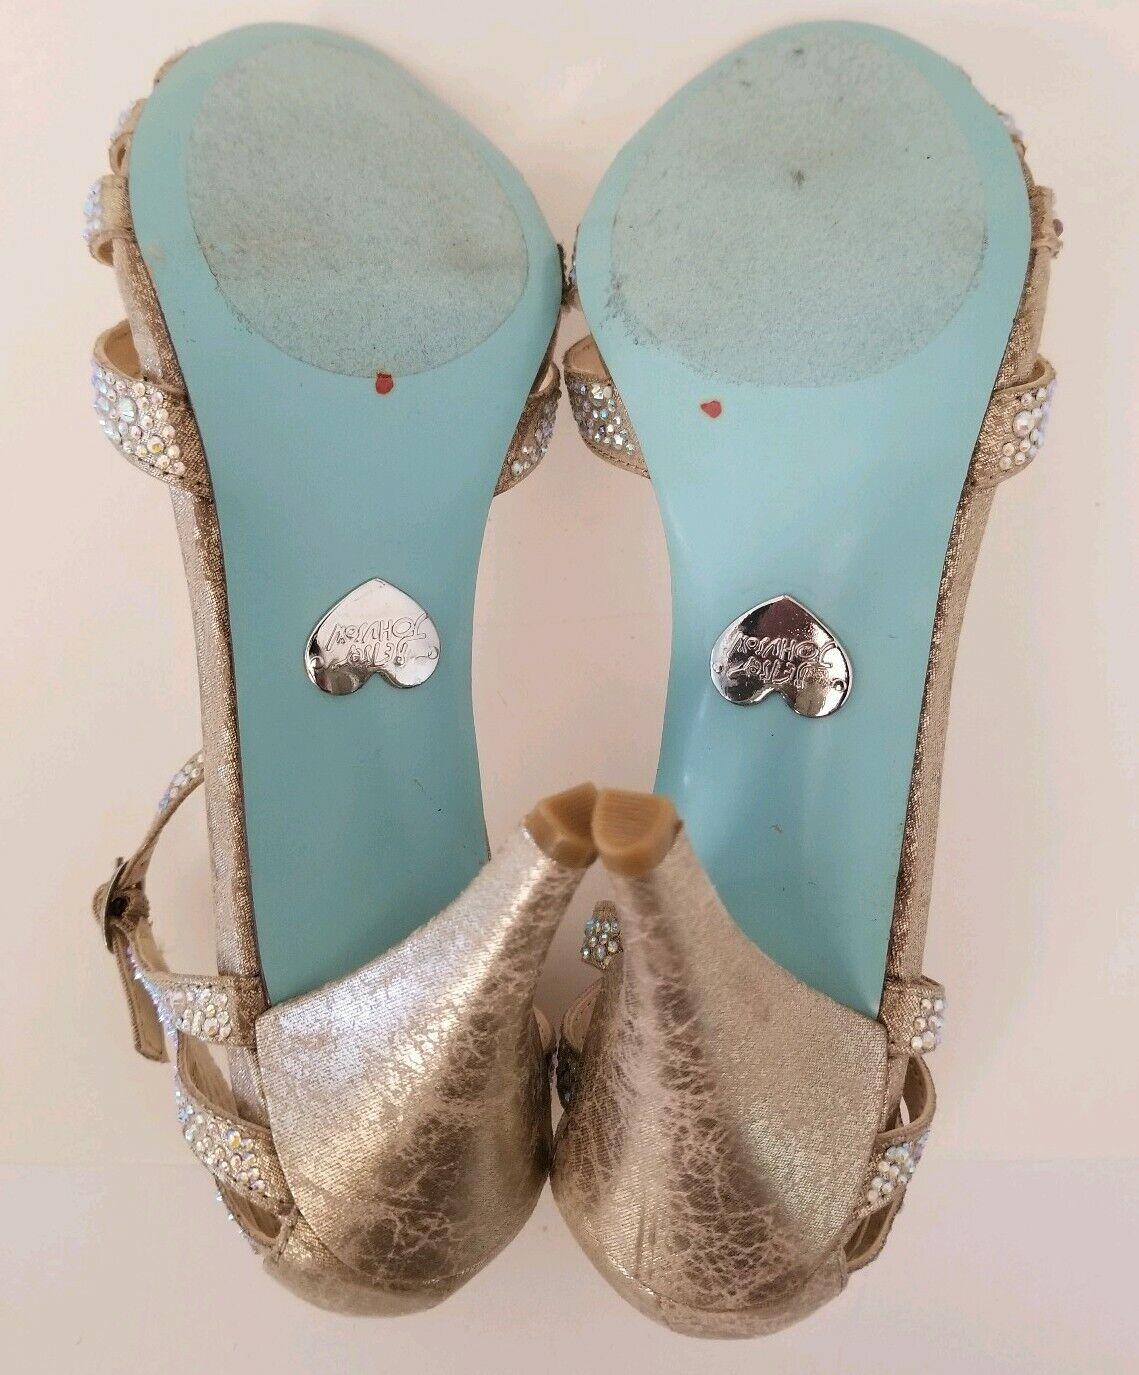 BHLDN Betsey Johnson Champagne Sparkle Iridescent Ankle Strap Strap Strap Heels Größe 6.5 New 4b8c05